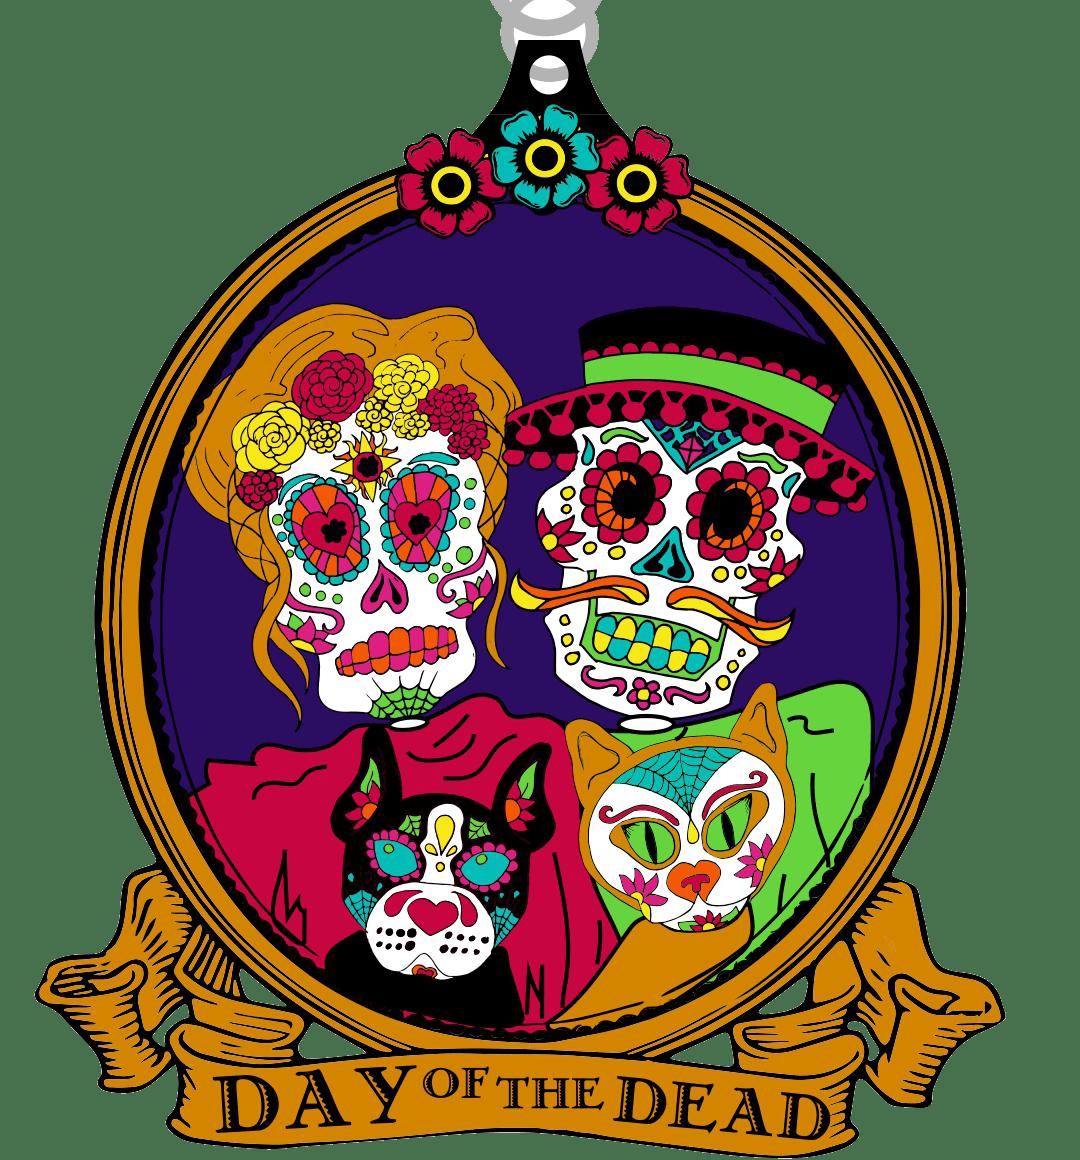 2019 Day of the Dead 1 Mile, 5K, 10K, 13.1, 26.2 - Tucson